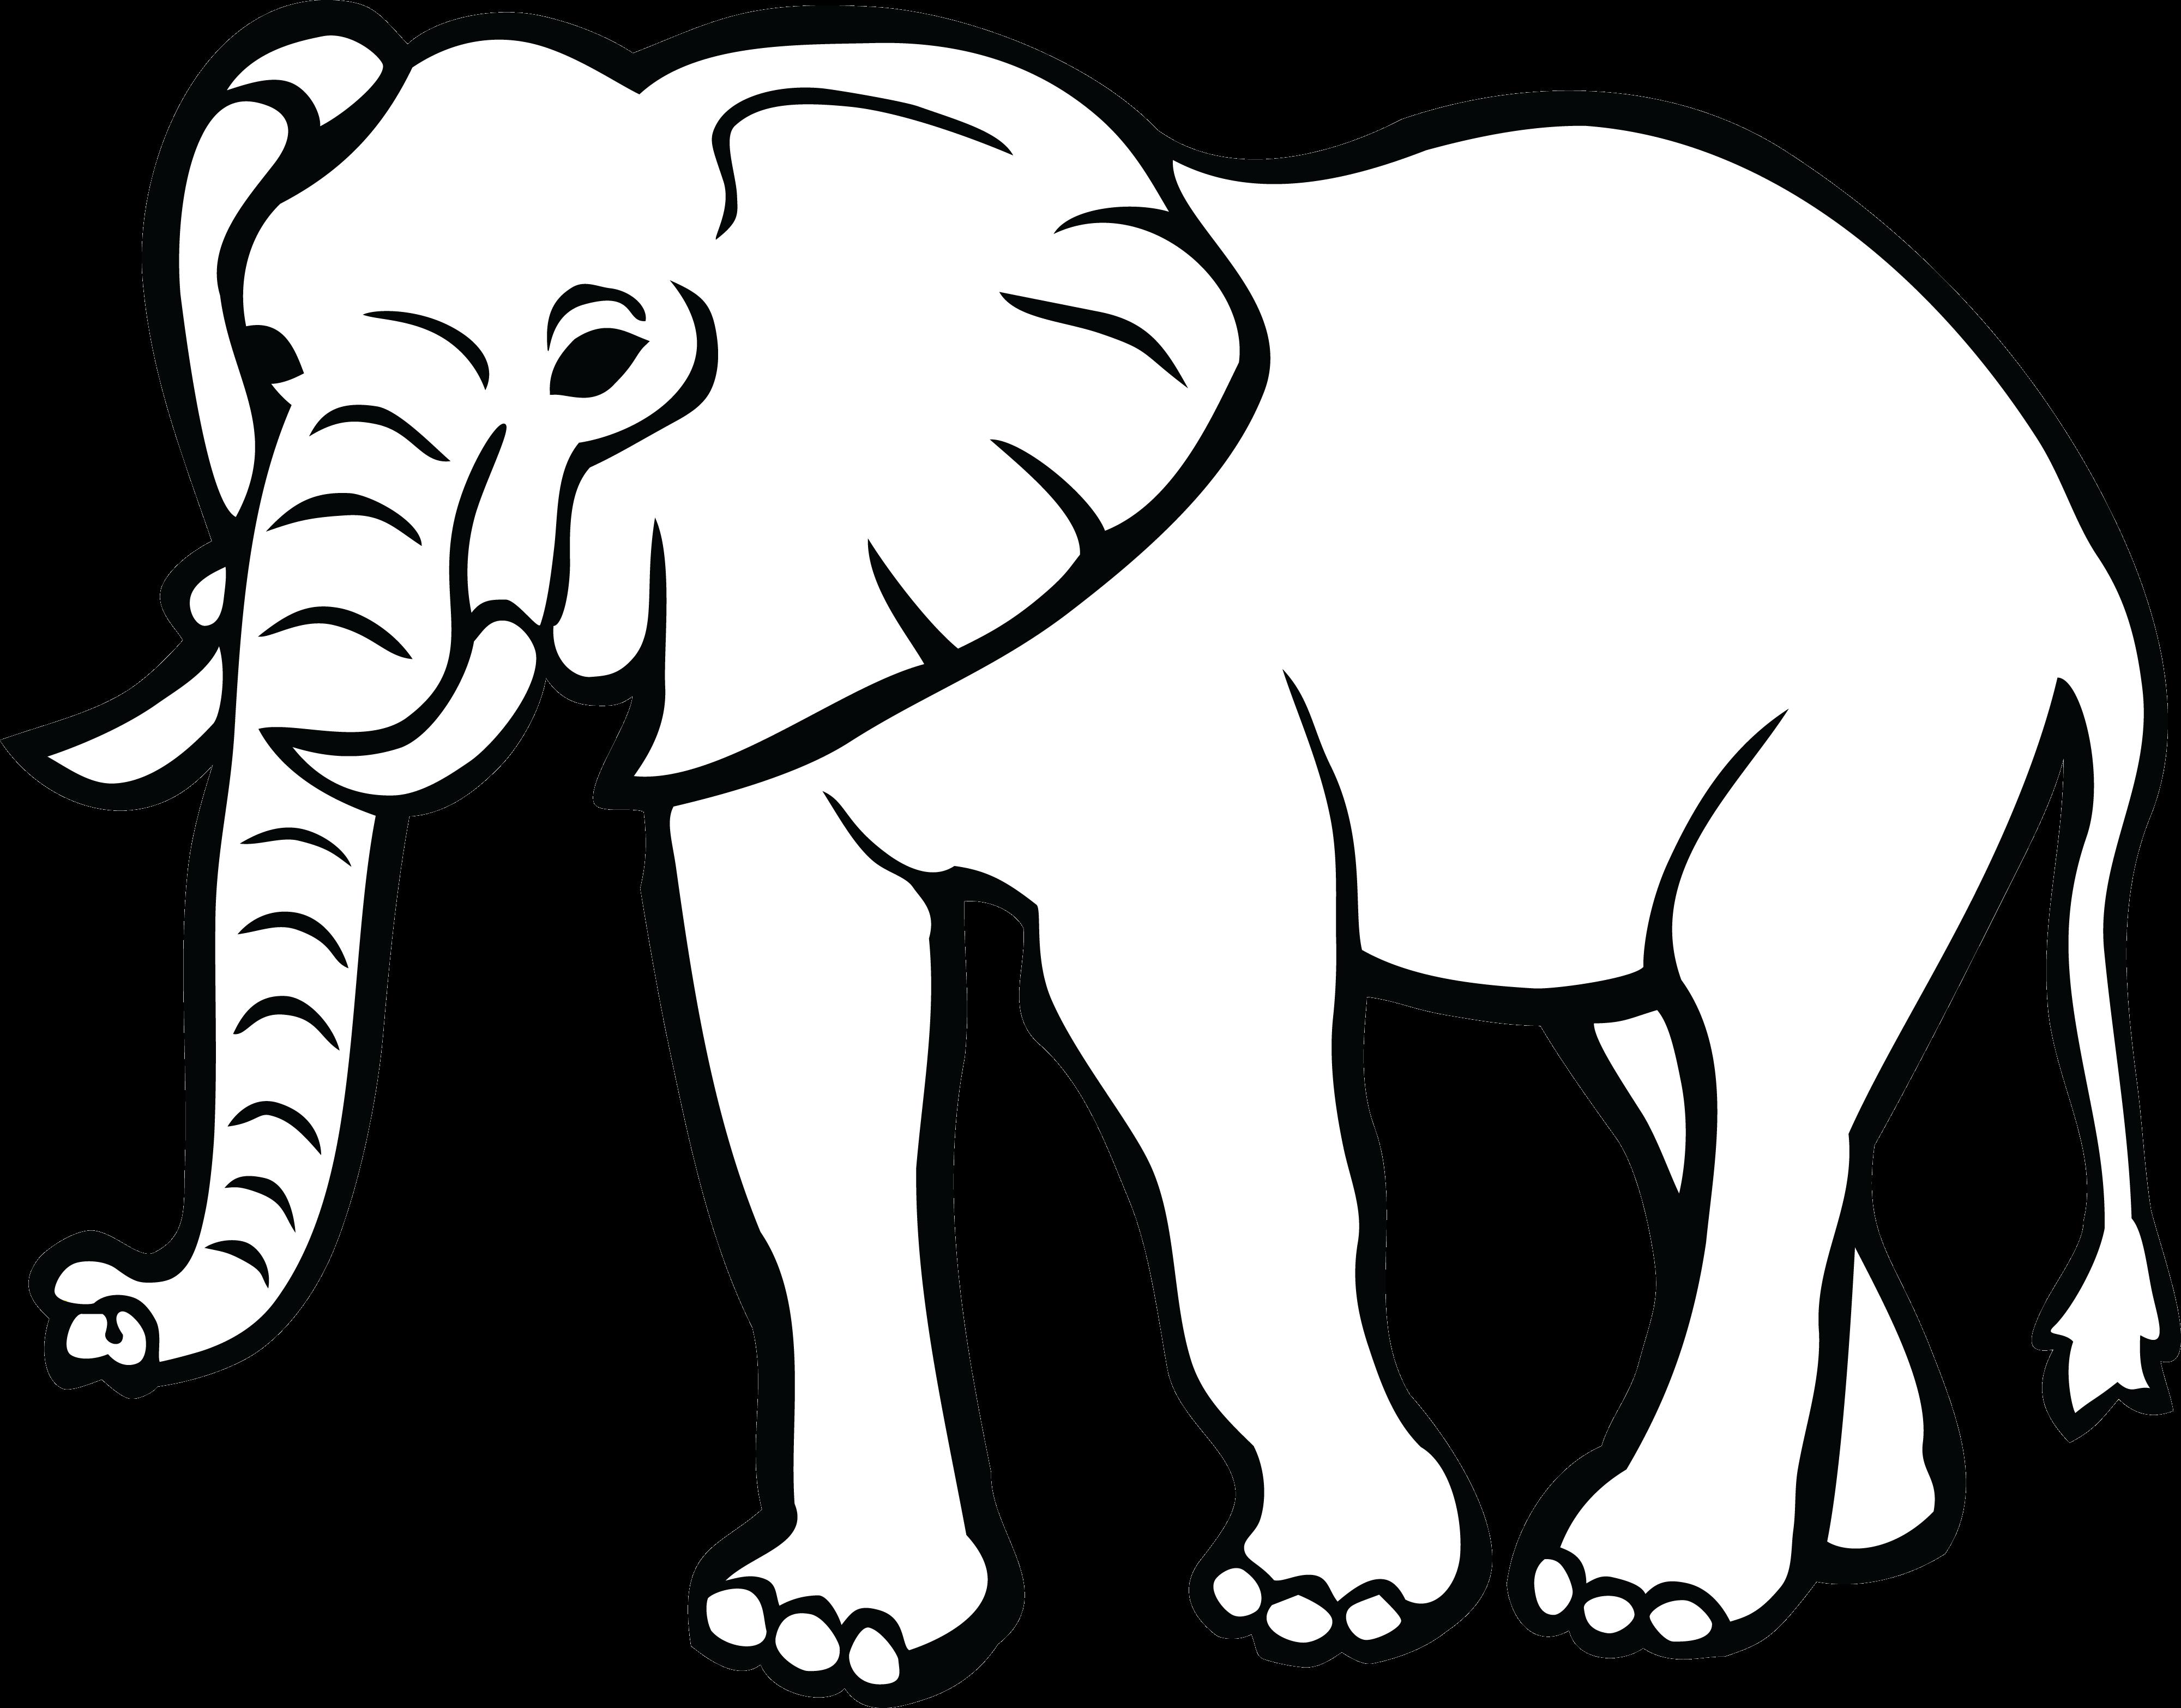 Clipart black and white image of elephant clipart Elephant Elephants Clipart Black And White For Free On Mbtskoudsalg ... clipart